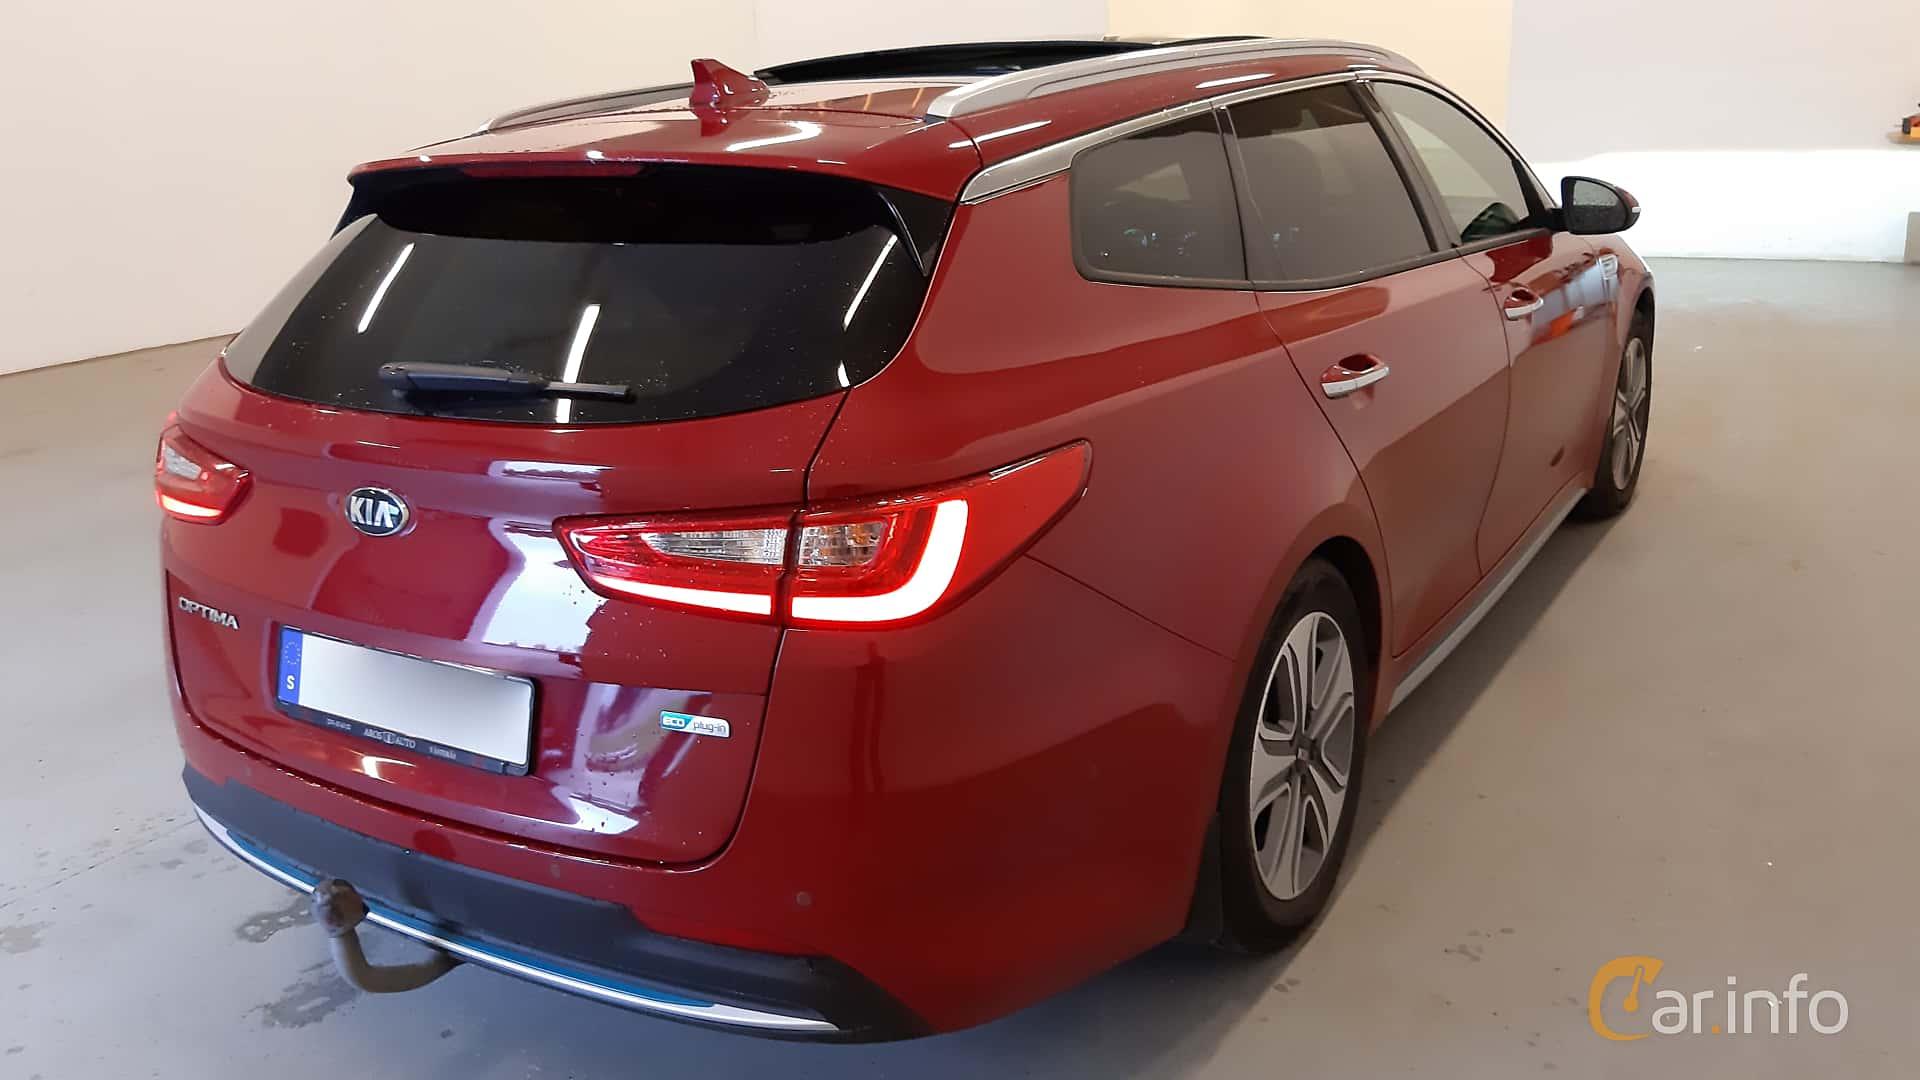 Kia Optima Sport Wagon Hybrid P-HEV 2.0 Hybrid Automatic, 205hp, 2018